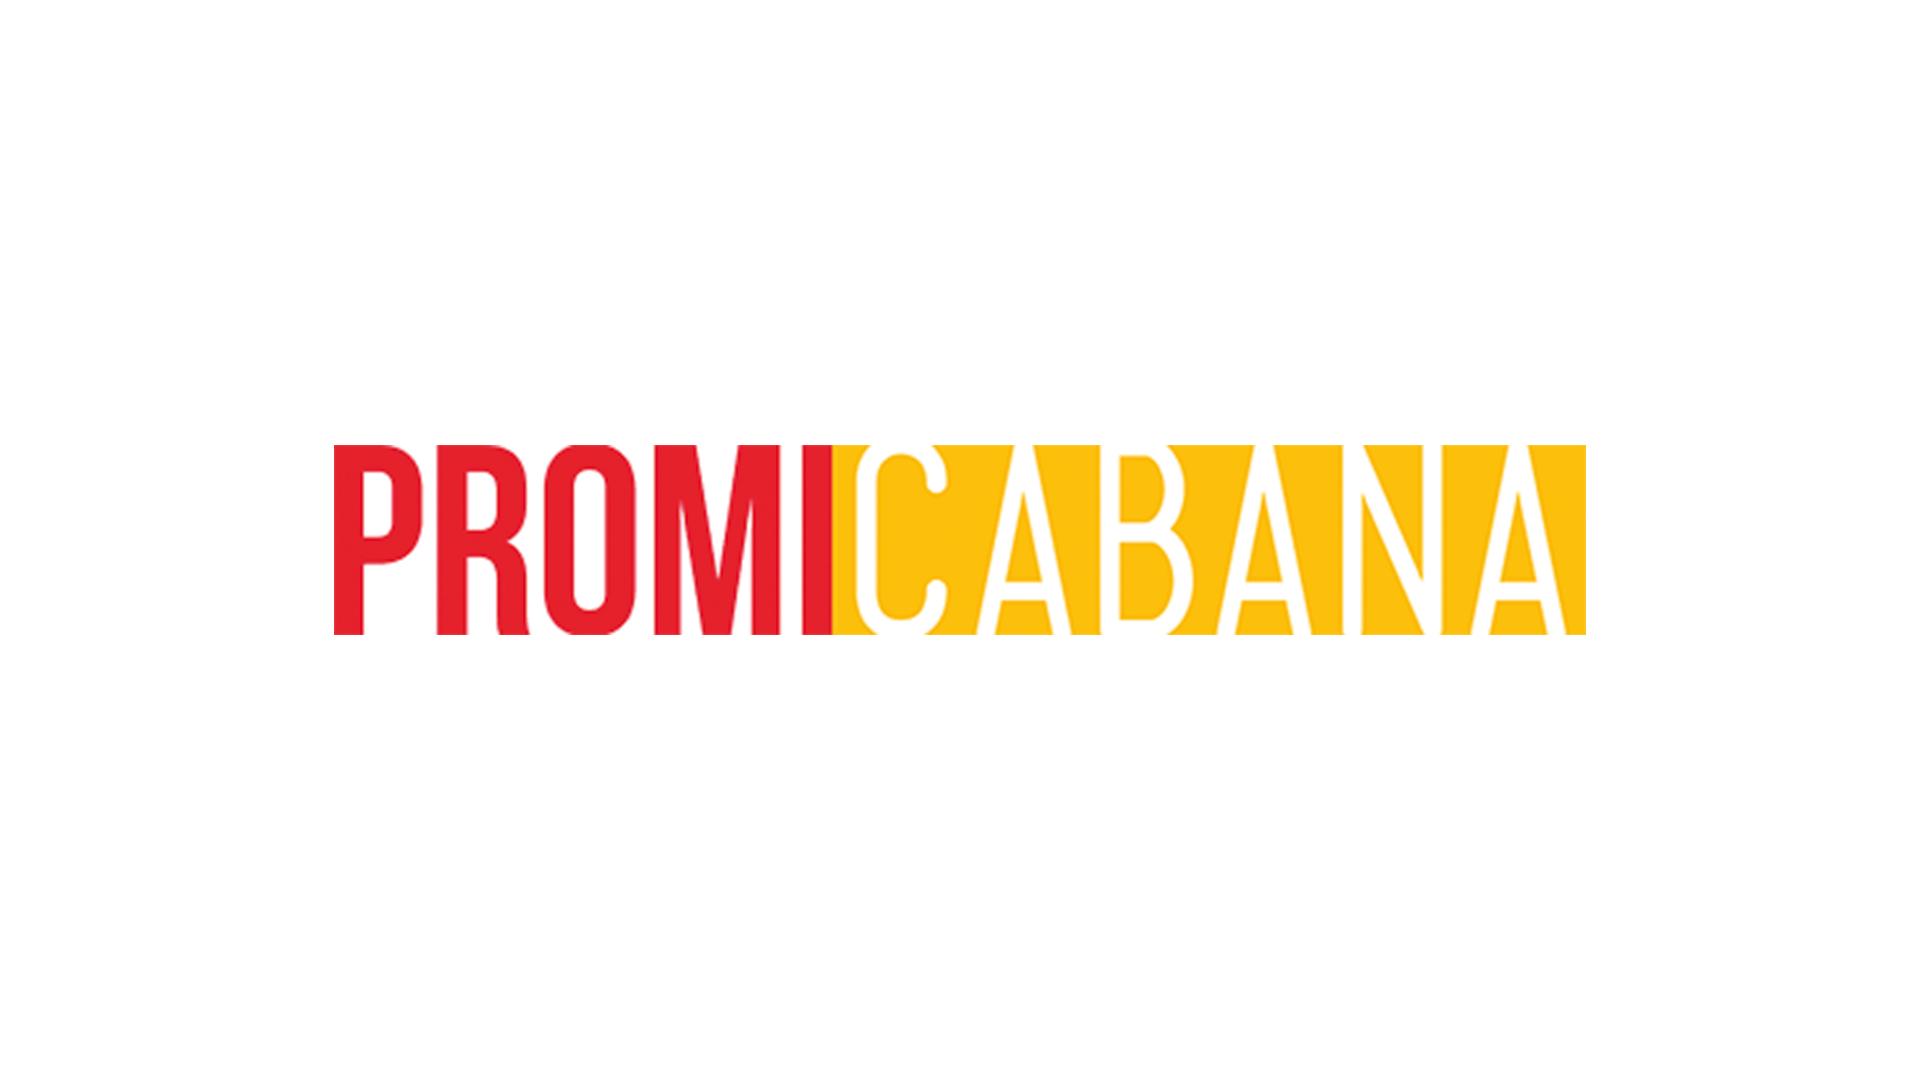 Justin-Bieber-Radiointerview-Penis-London